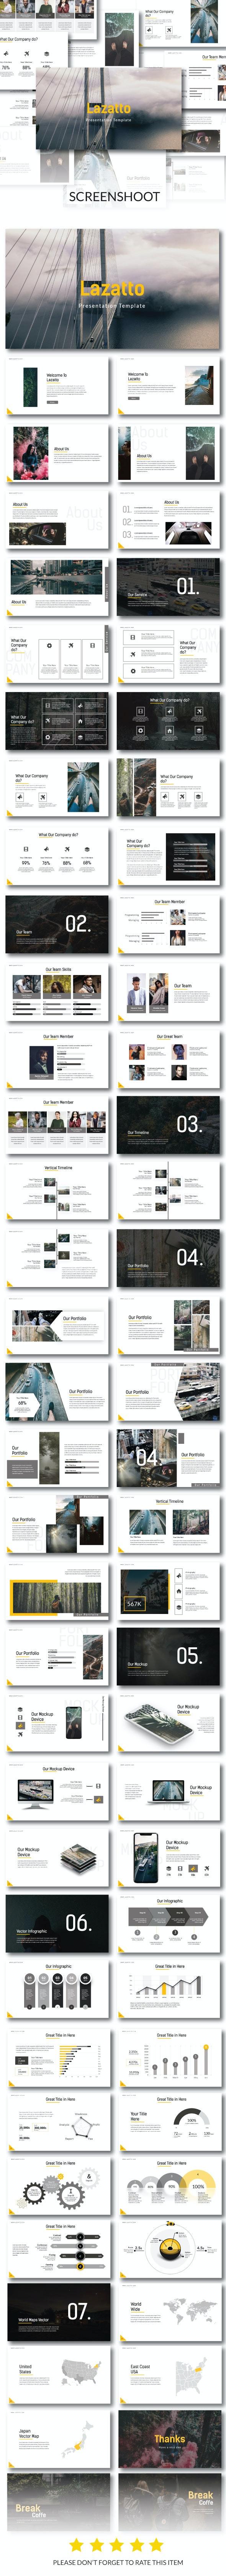 Lazatto - Powerpoint Template - PowerPoint Templates Presentation Templates